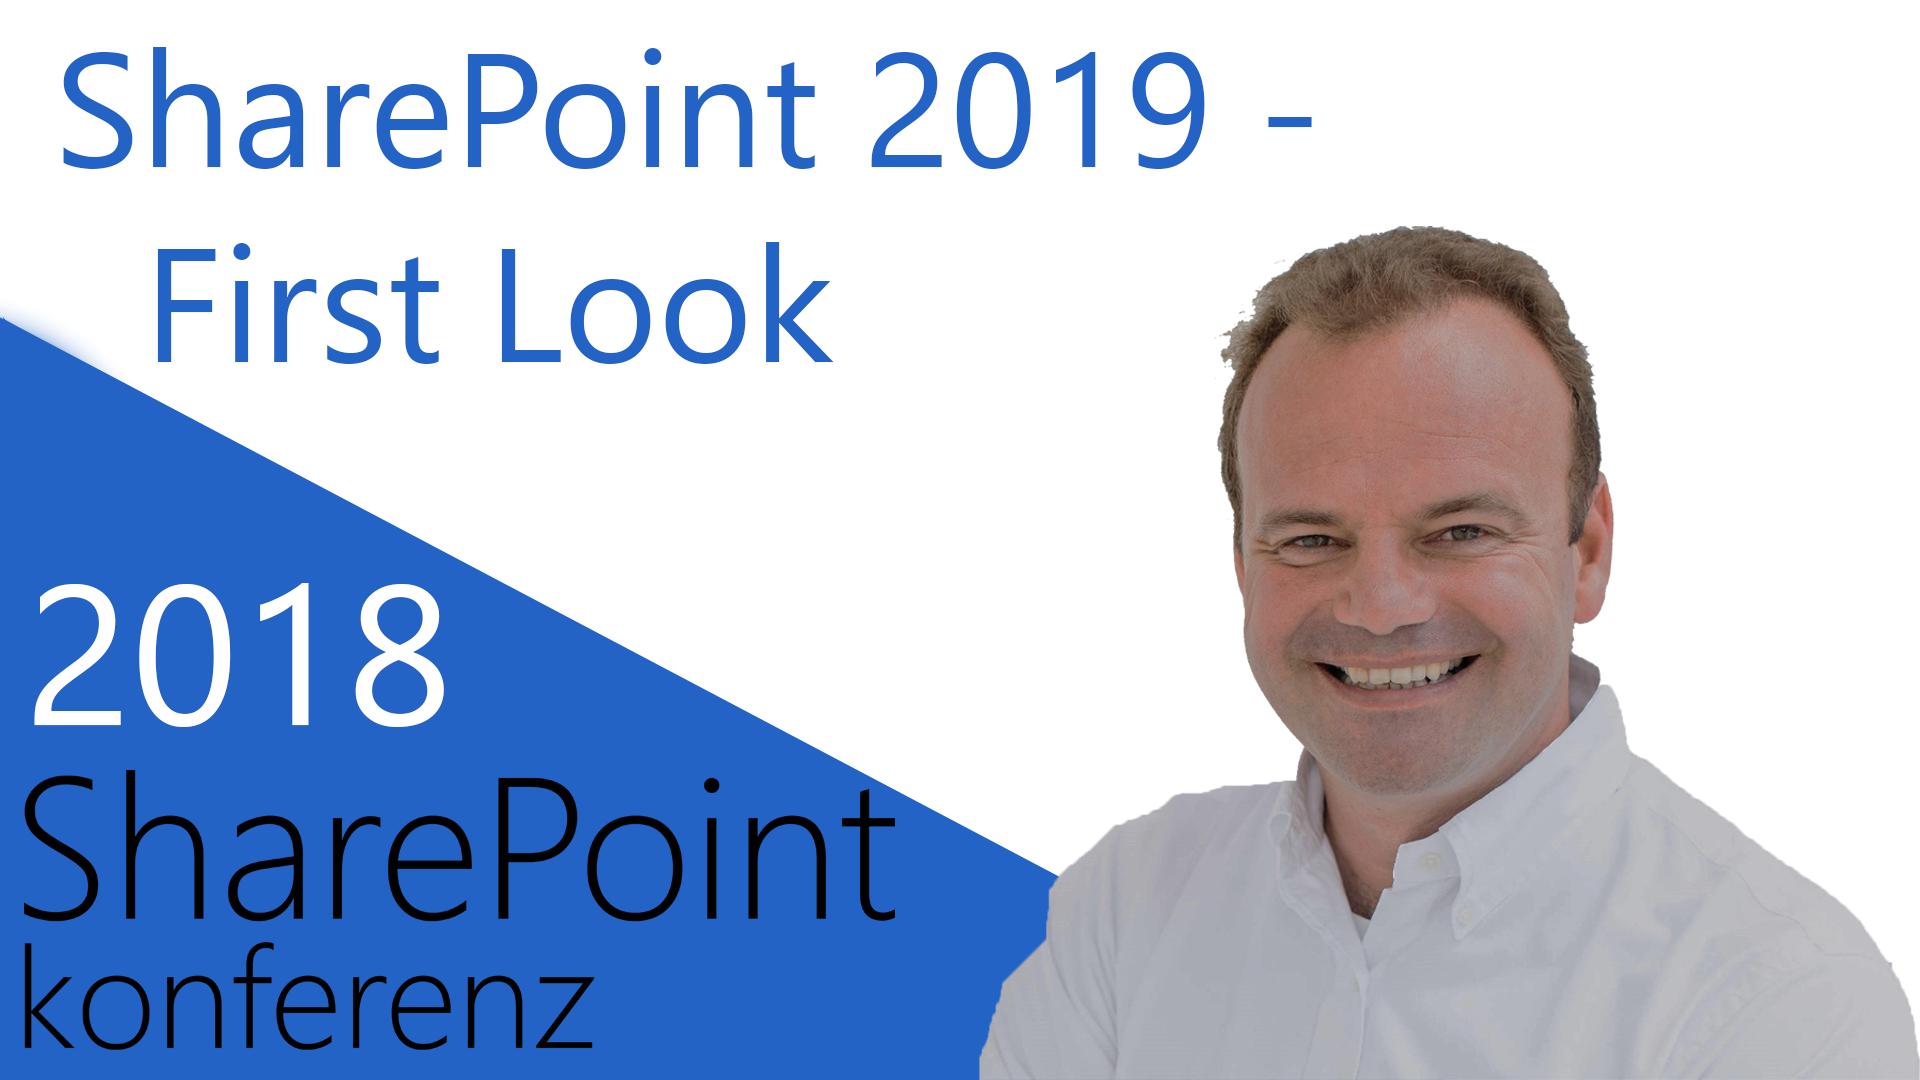 2018/SharePointKonferenz/sharepoint2019